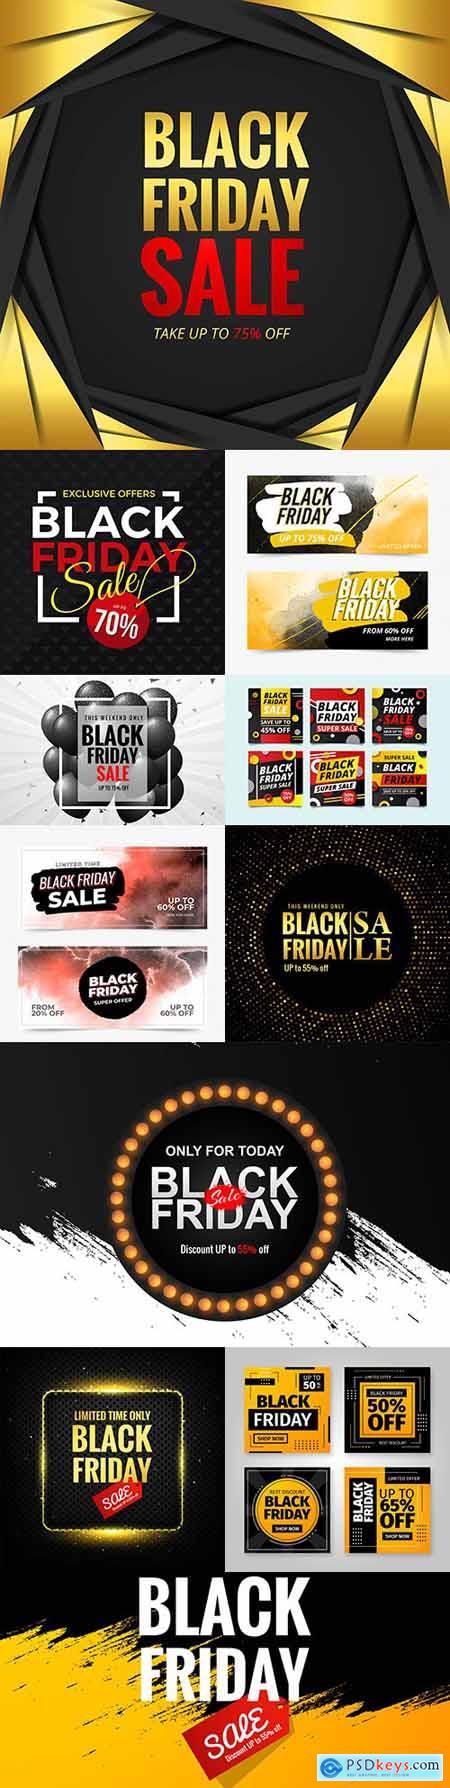 Black Friday and sale special design illustration 33